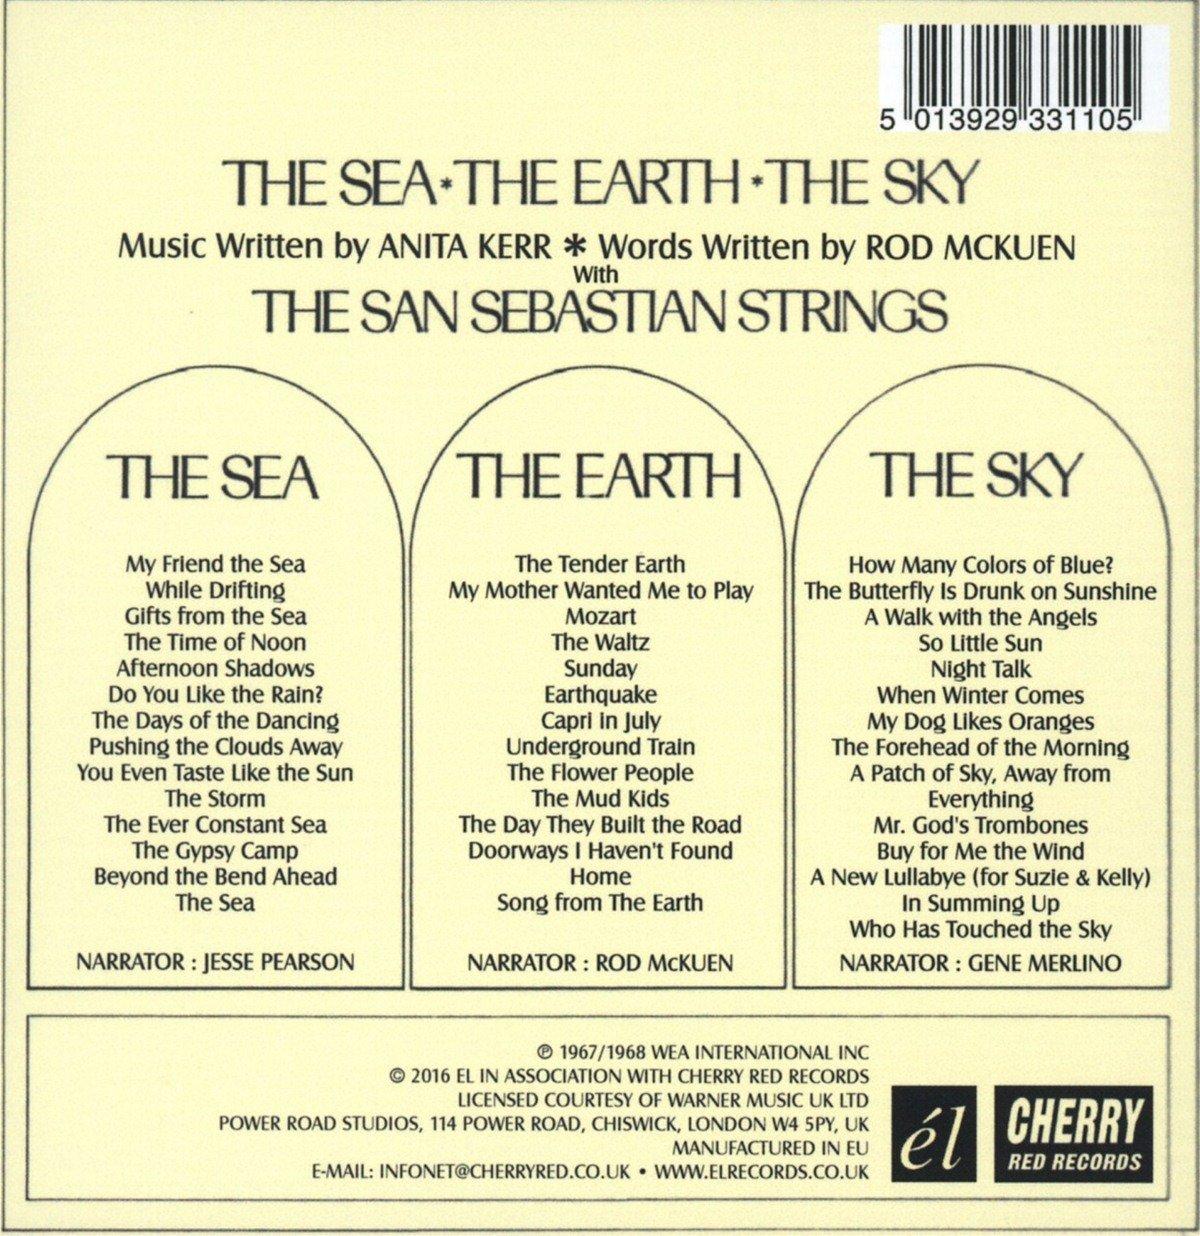 The Sea * The Earth * The Sky /  Rod Mckuen / Anita Kerr & The San Sebastian Strings by EL